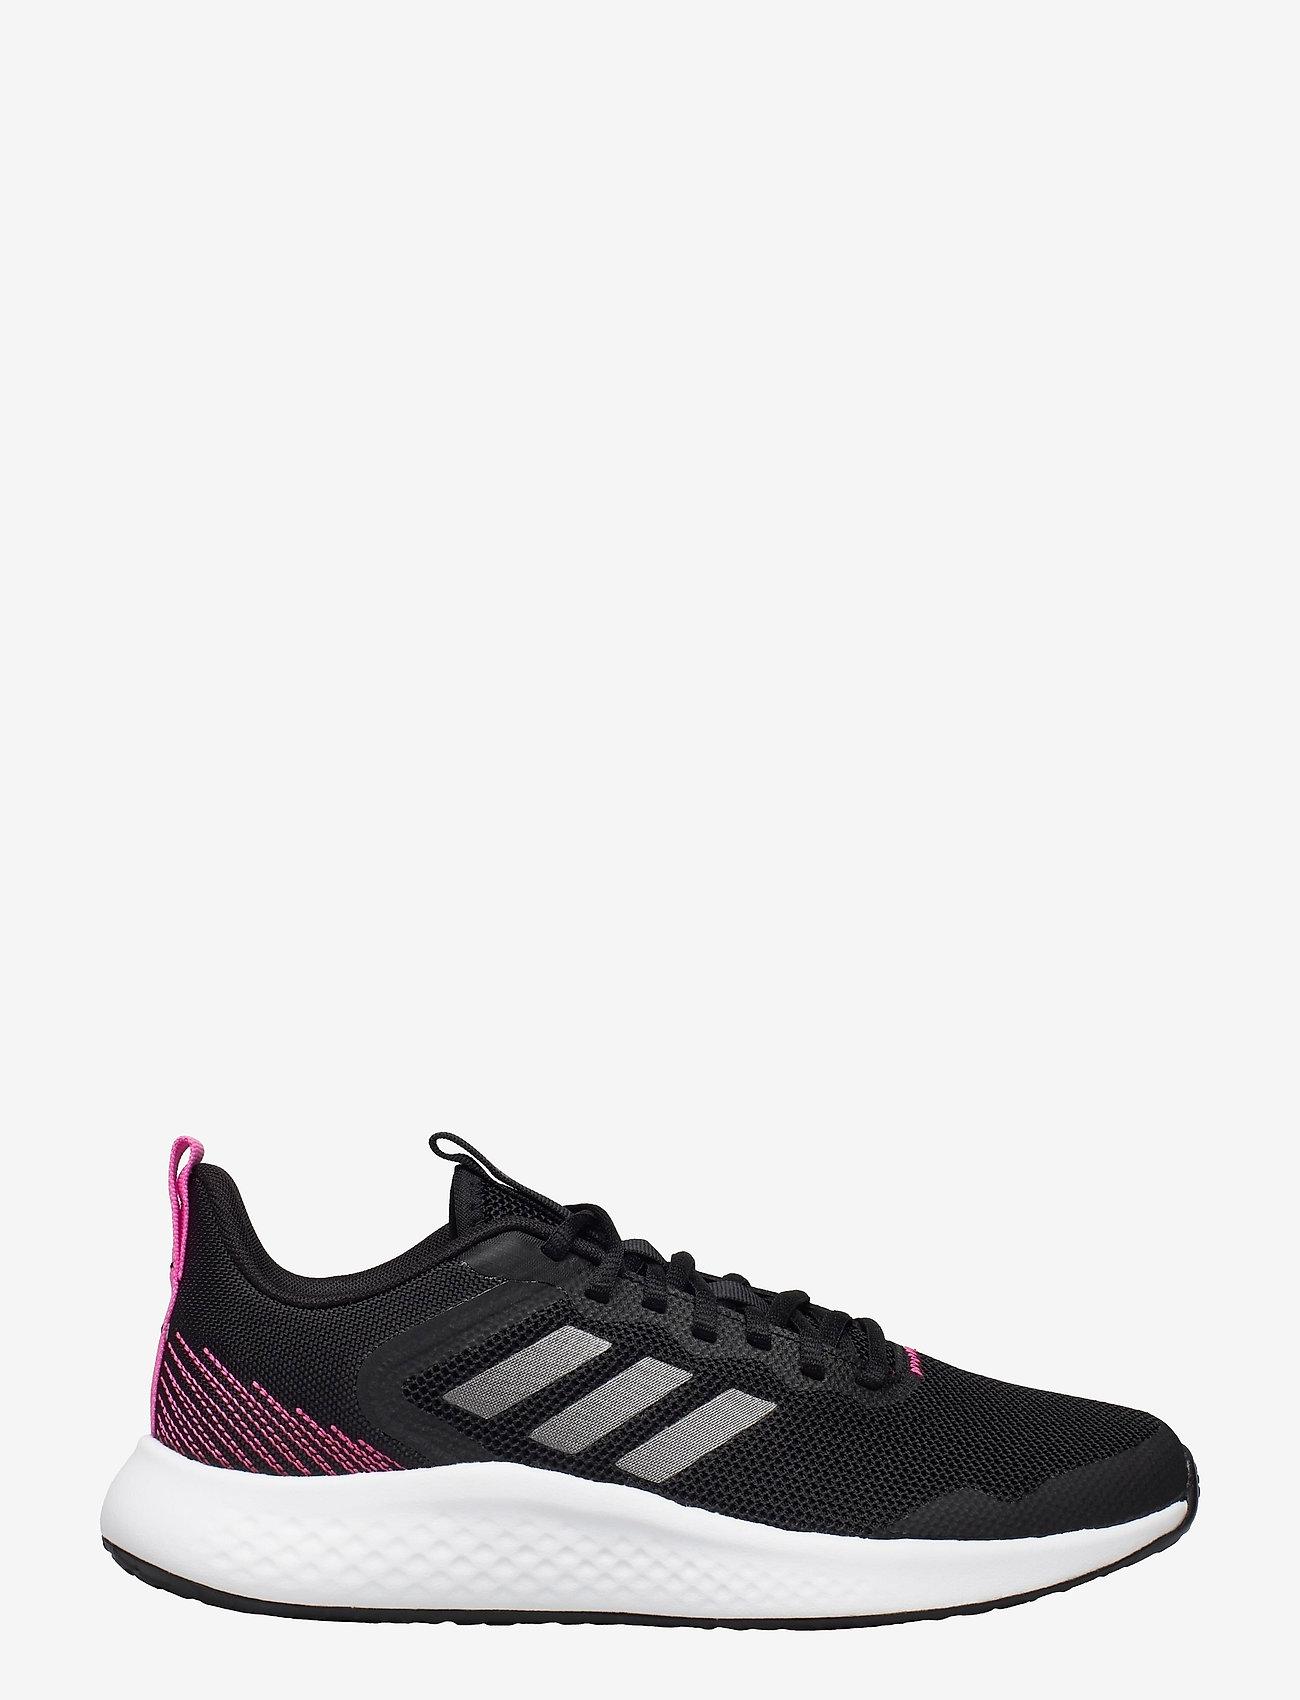 adidas Performance - Fluidstreet  W - running shoes - cblack/ironmt/scrpnk - 1